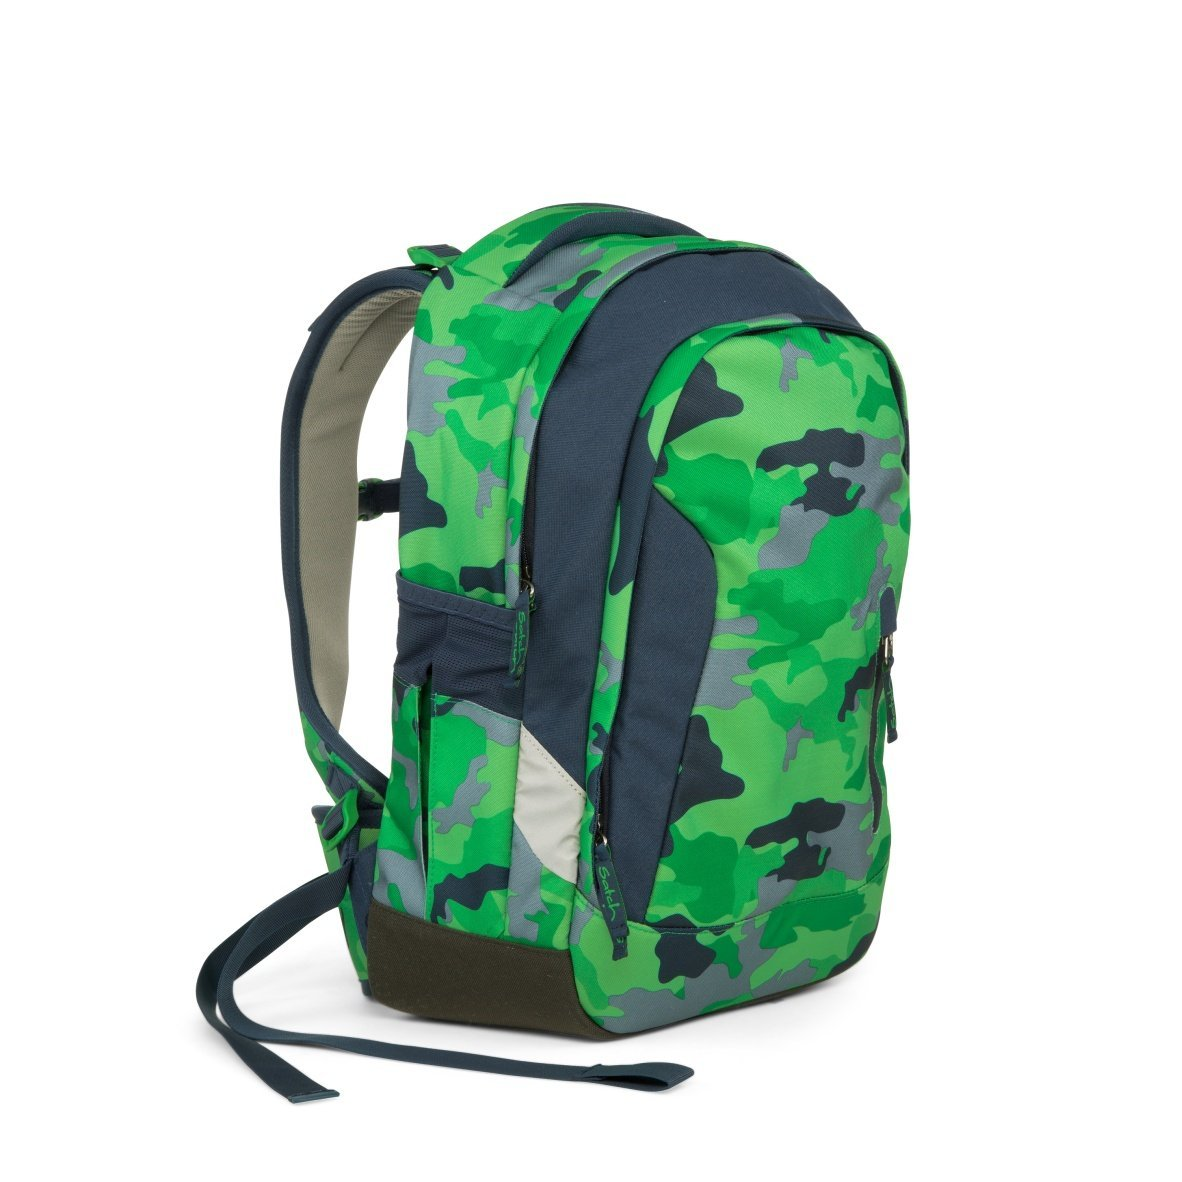 Рюкзак Ergobag Satch Sleek цвет Green Camou, - фото 8